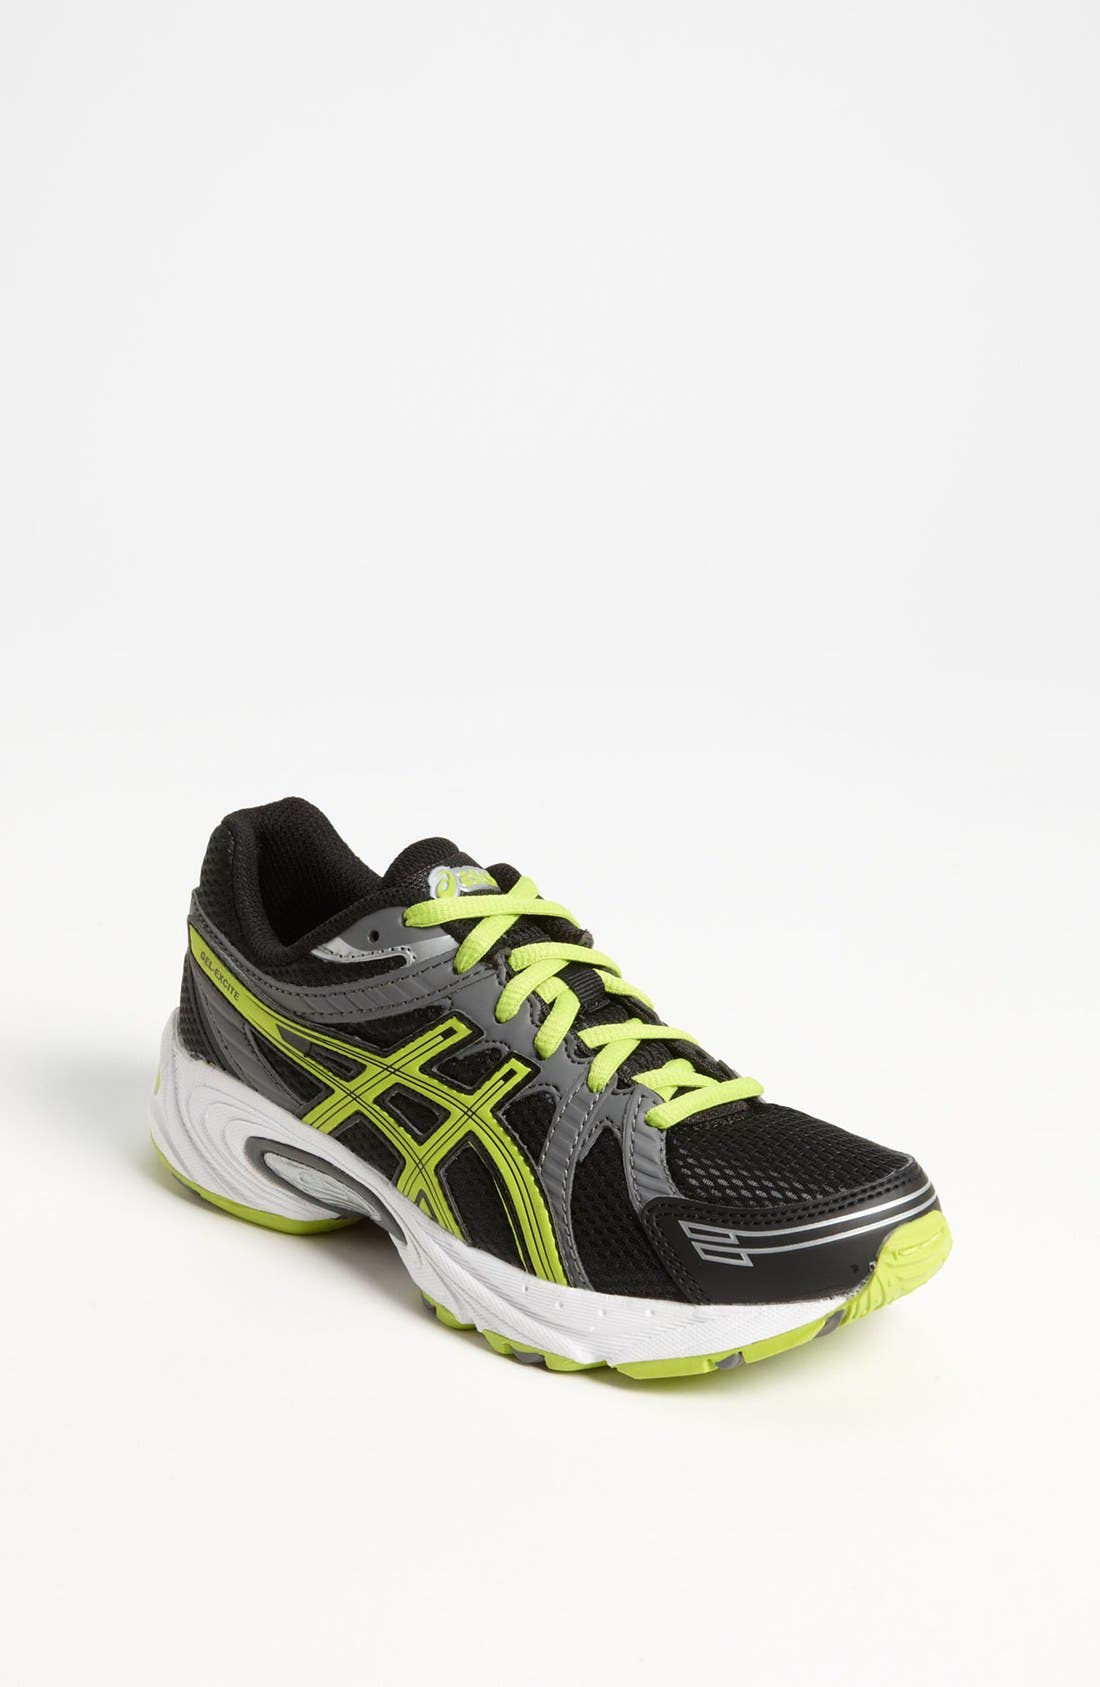 Alternate Image 1 Selected - ASICS® 'GEL-Excite' Running Shoe (Big Kid)